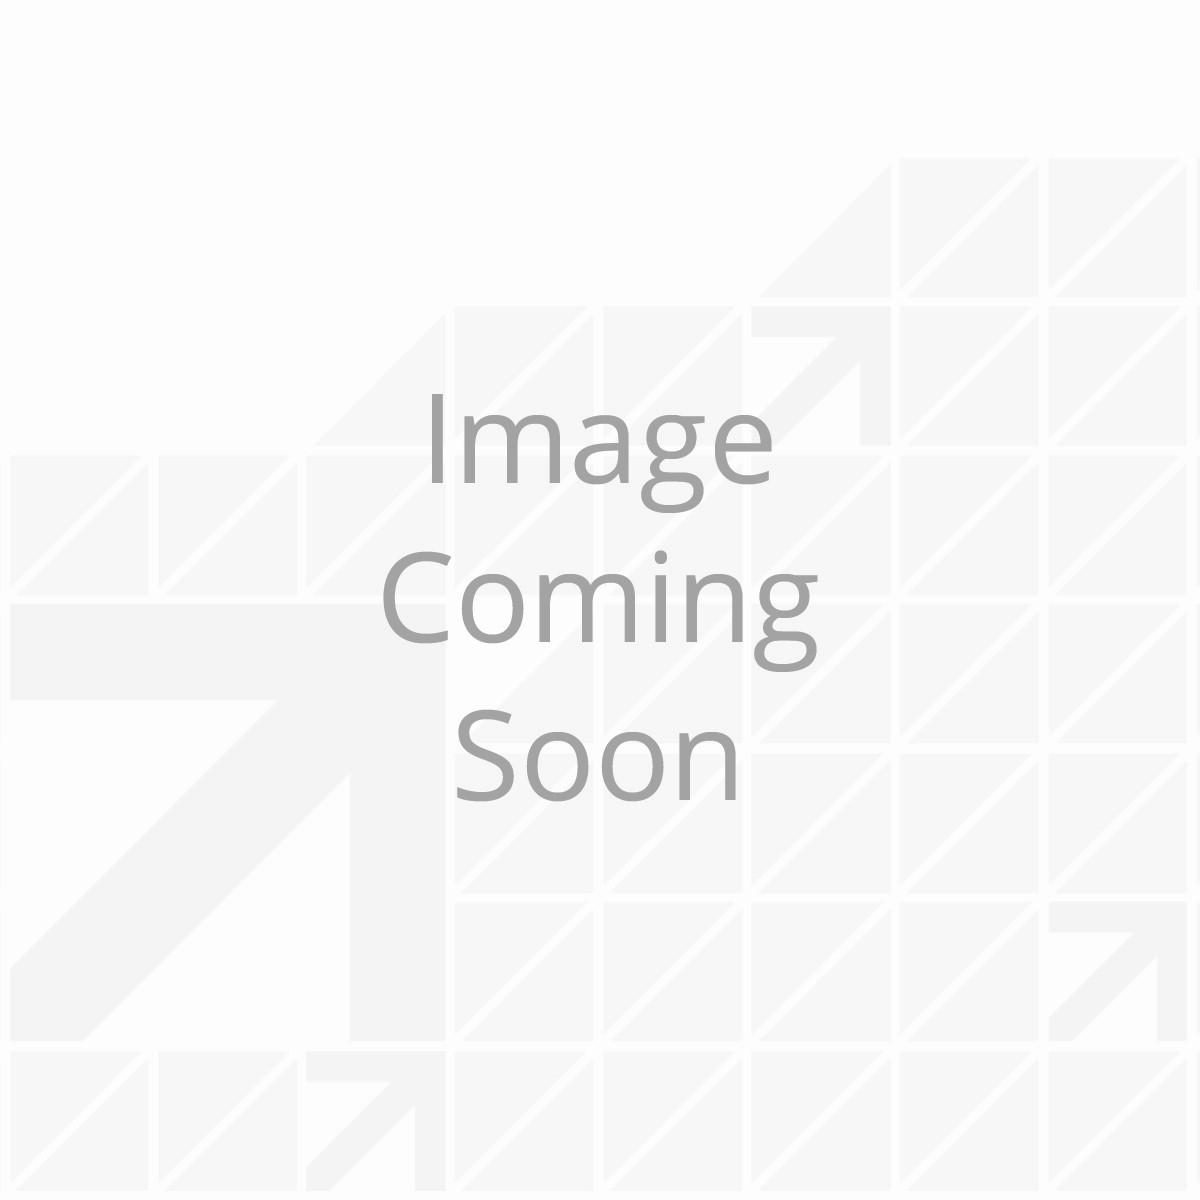 14' Power & Hybrid Awning Roller Assembly - Prepflex Burgundy Fade